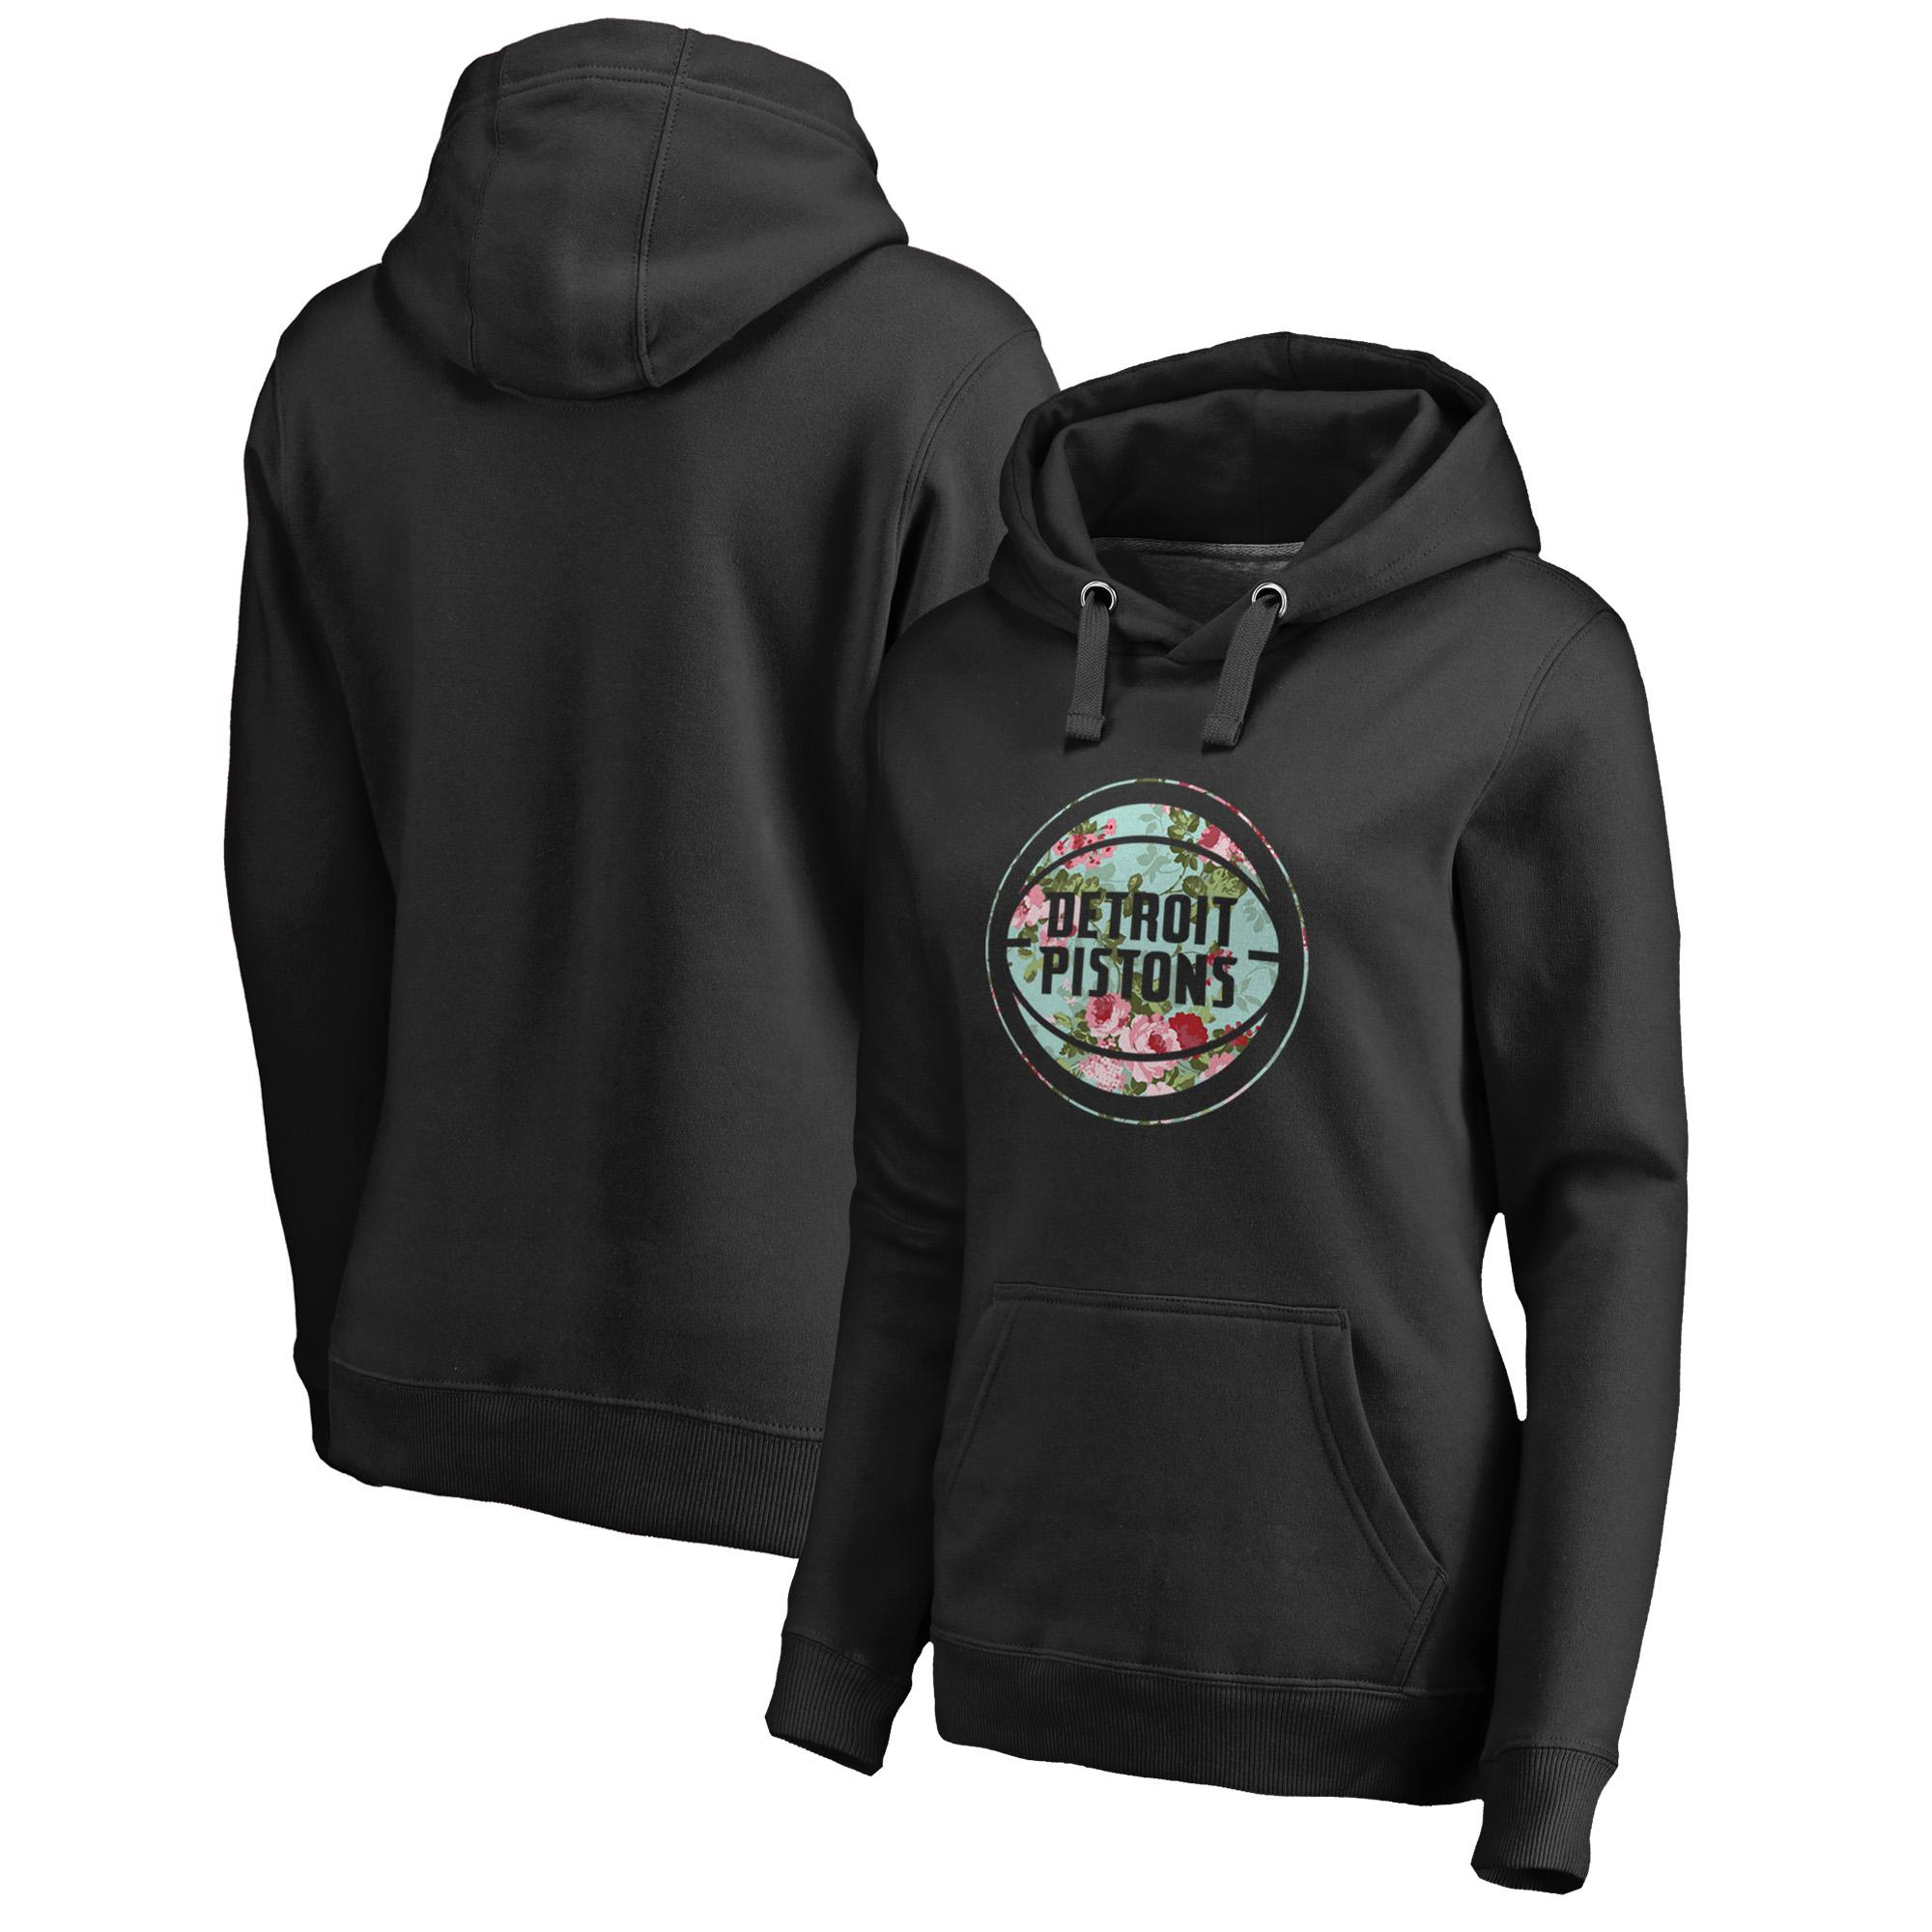 Detroit Pistons Fanatics Branded Women's Lovely Pullover Hoodie - Black